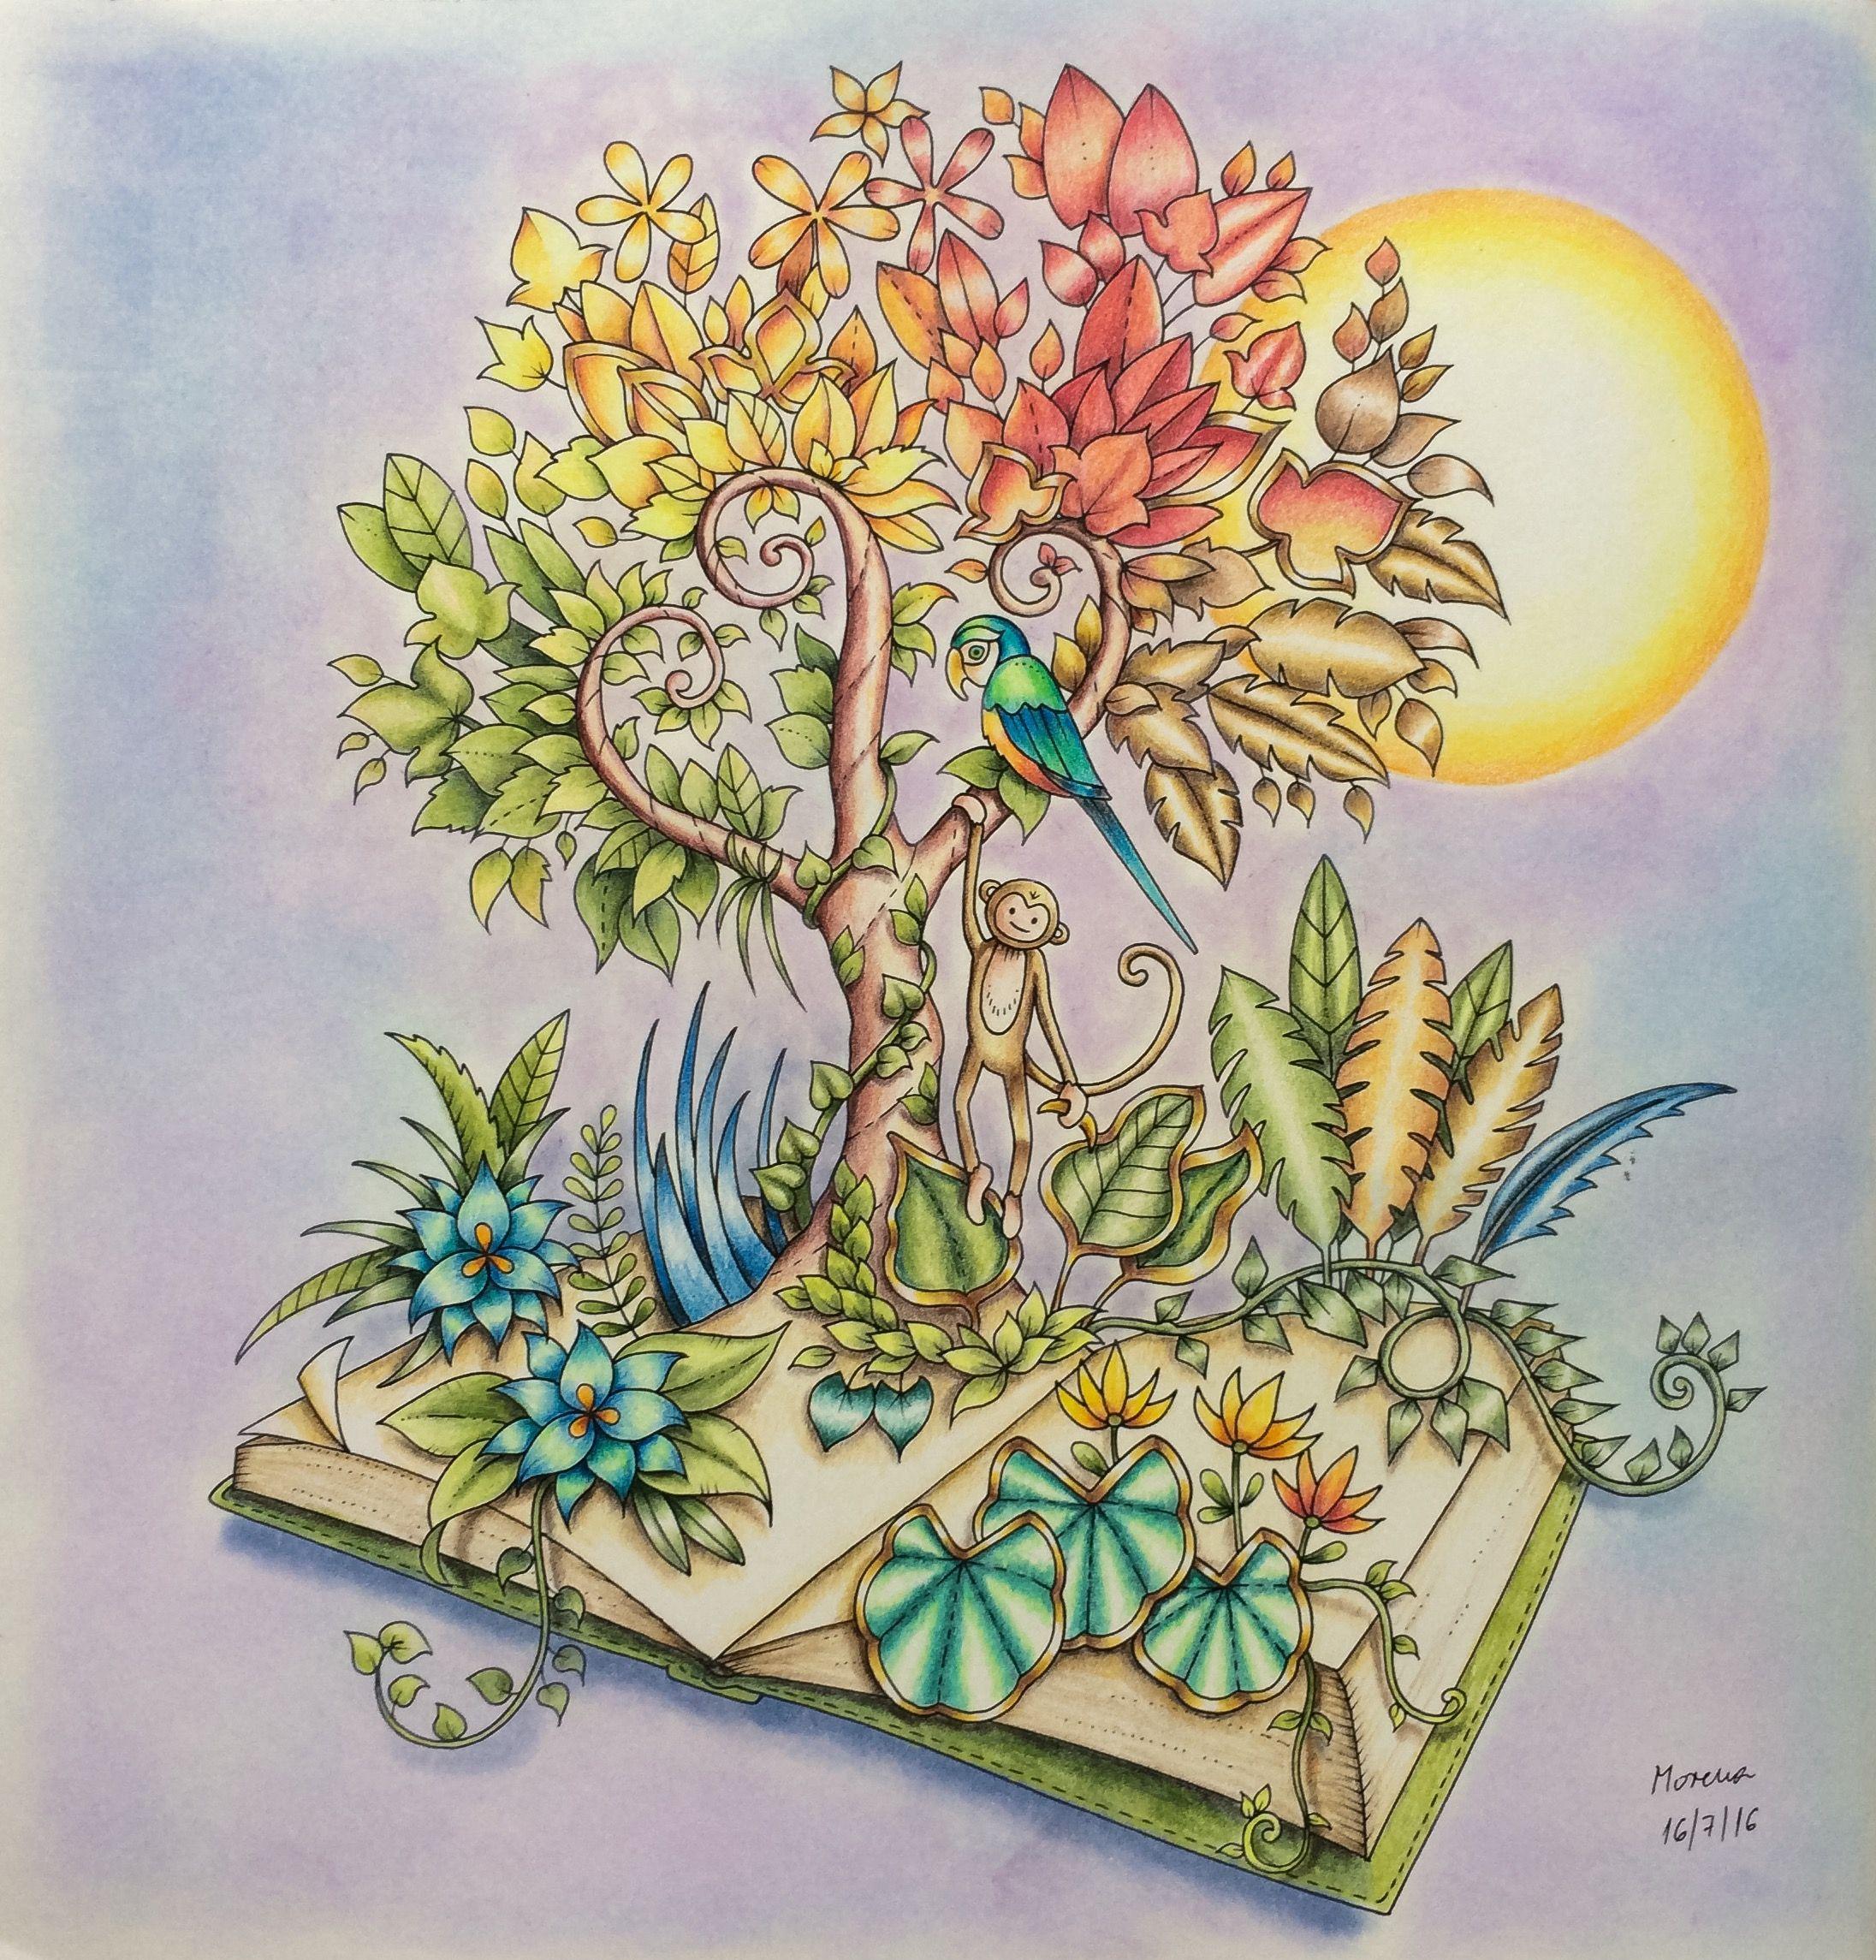 Magical Jungle By Johanna Basford Coloured By Morena